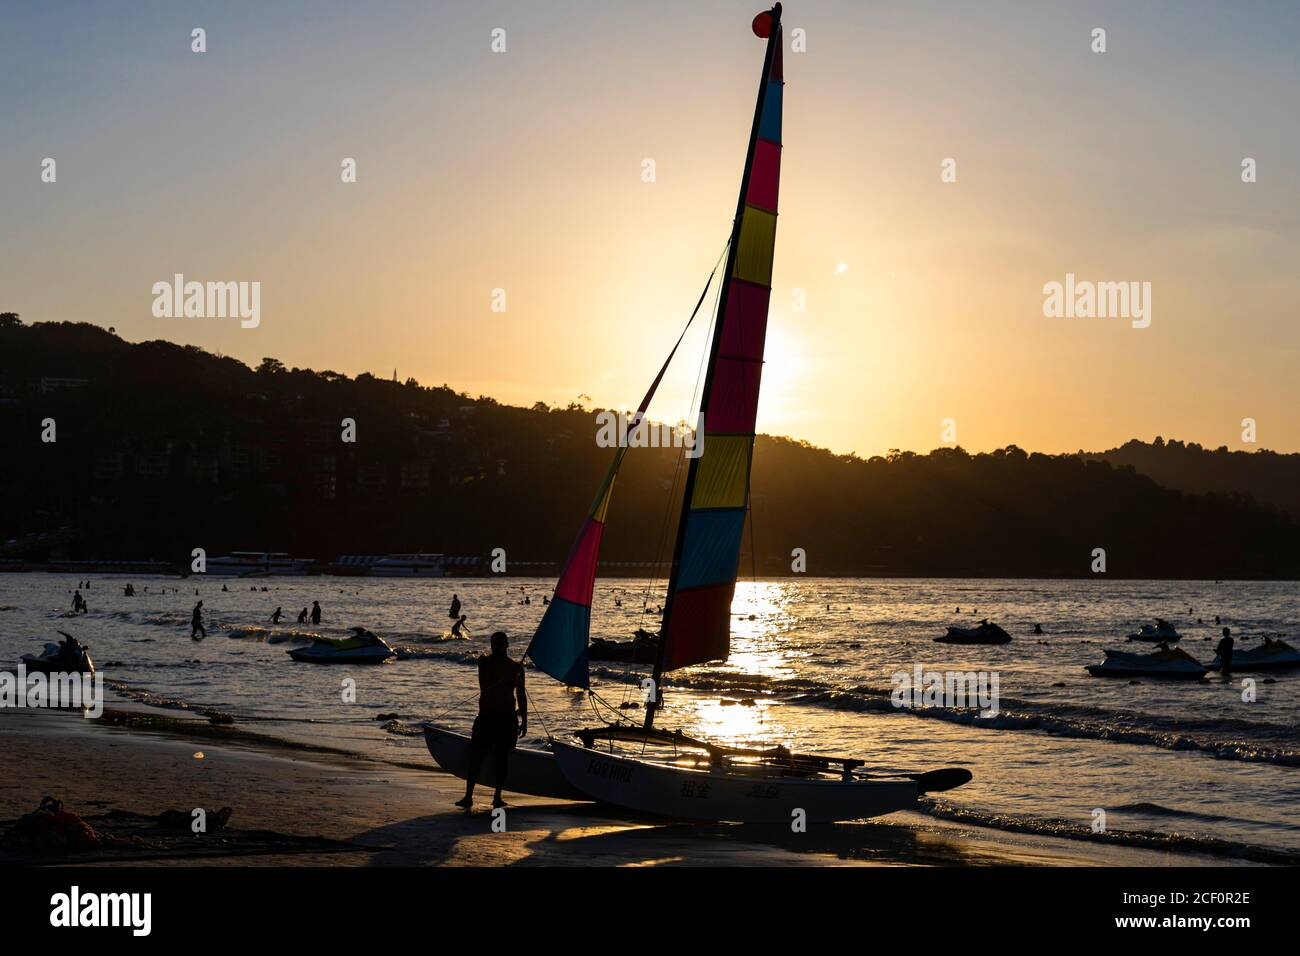 Sailing boat for hire on Patong Beach at sunset, Phuket, Thailand Stock Photo